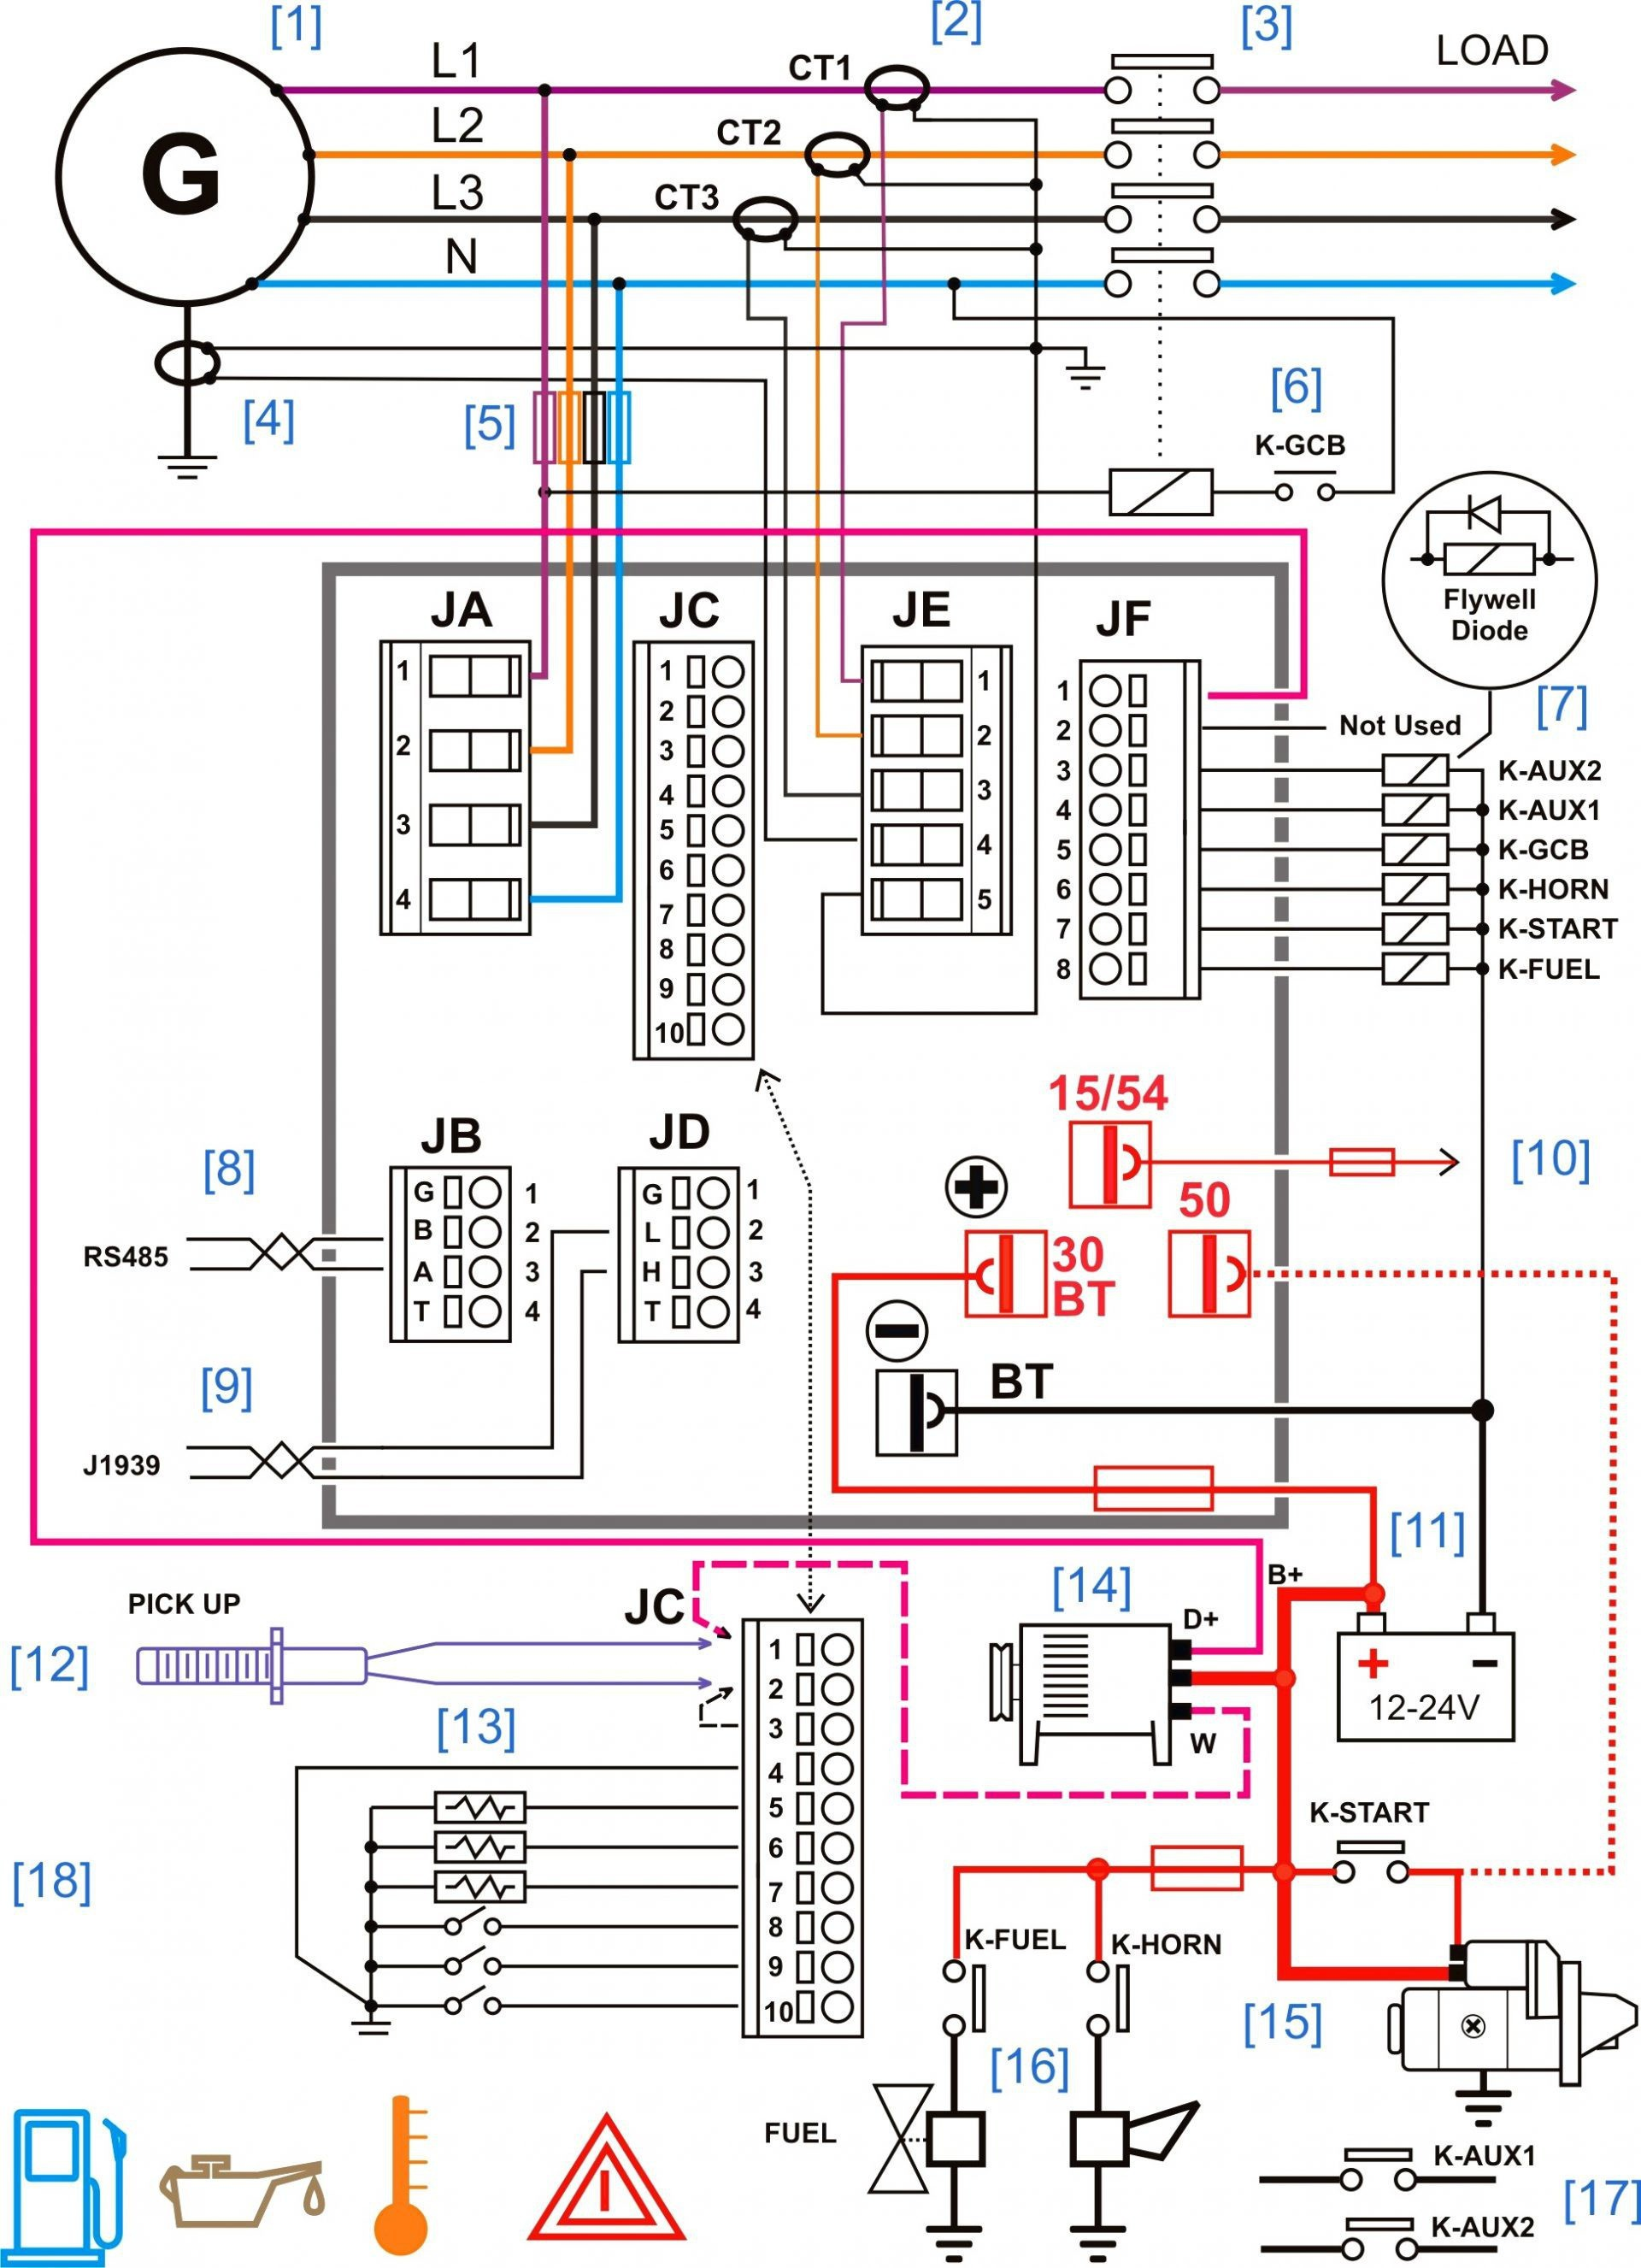 DIAGRAM] Fulham Workhorse 5 Ballast Wiring Diagram FULL Version HD Quality Wiring  Diagram - MMCDIAGRAM64.CASAMANUELLI.IT | Workhorse Ballast Wh5 Wiring Diagram |  | mmcdiagram64.casamanuelli.it